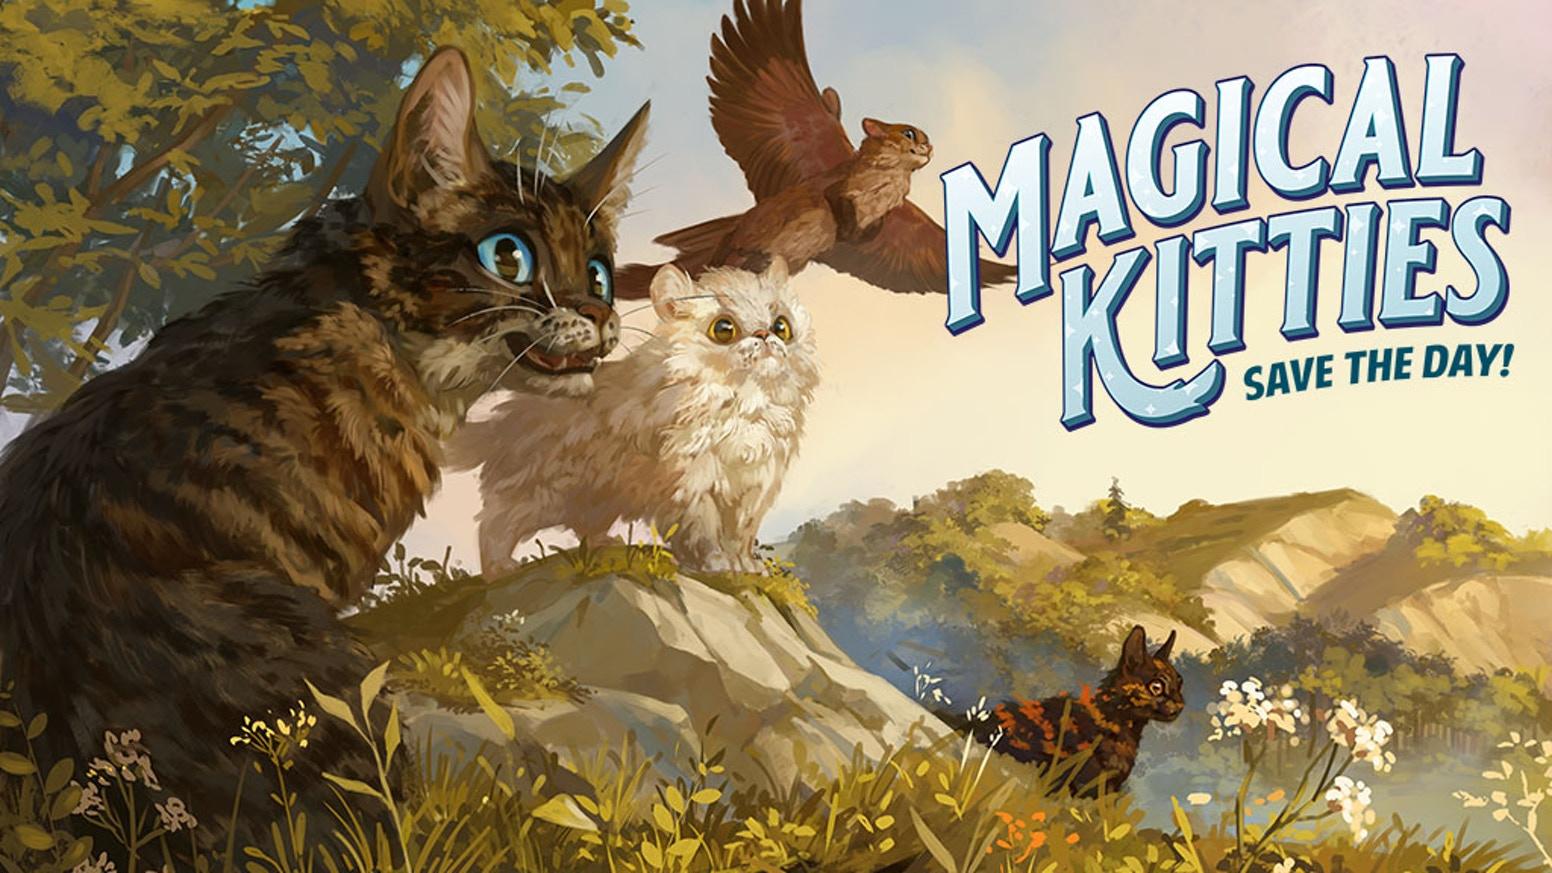 Magical Kitties Art Banner